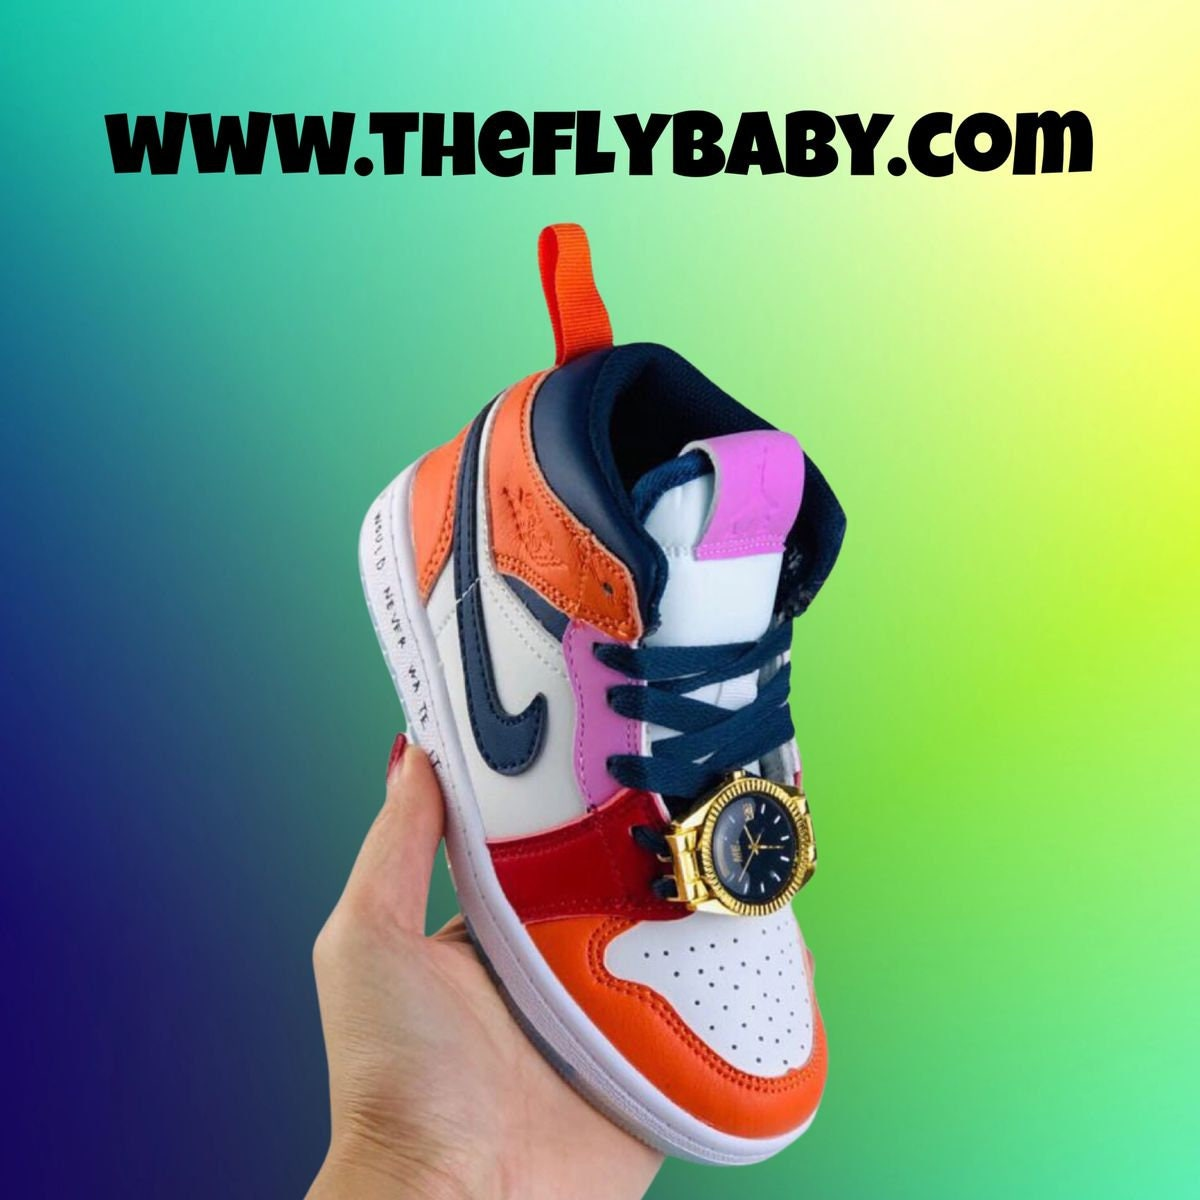 Kids Air Jordan 1 Mid Fearless Melody Ehsani/ Custom Kids Size Sneakers/ Hypebeast Sneakerhead Kicks Shoes